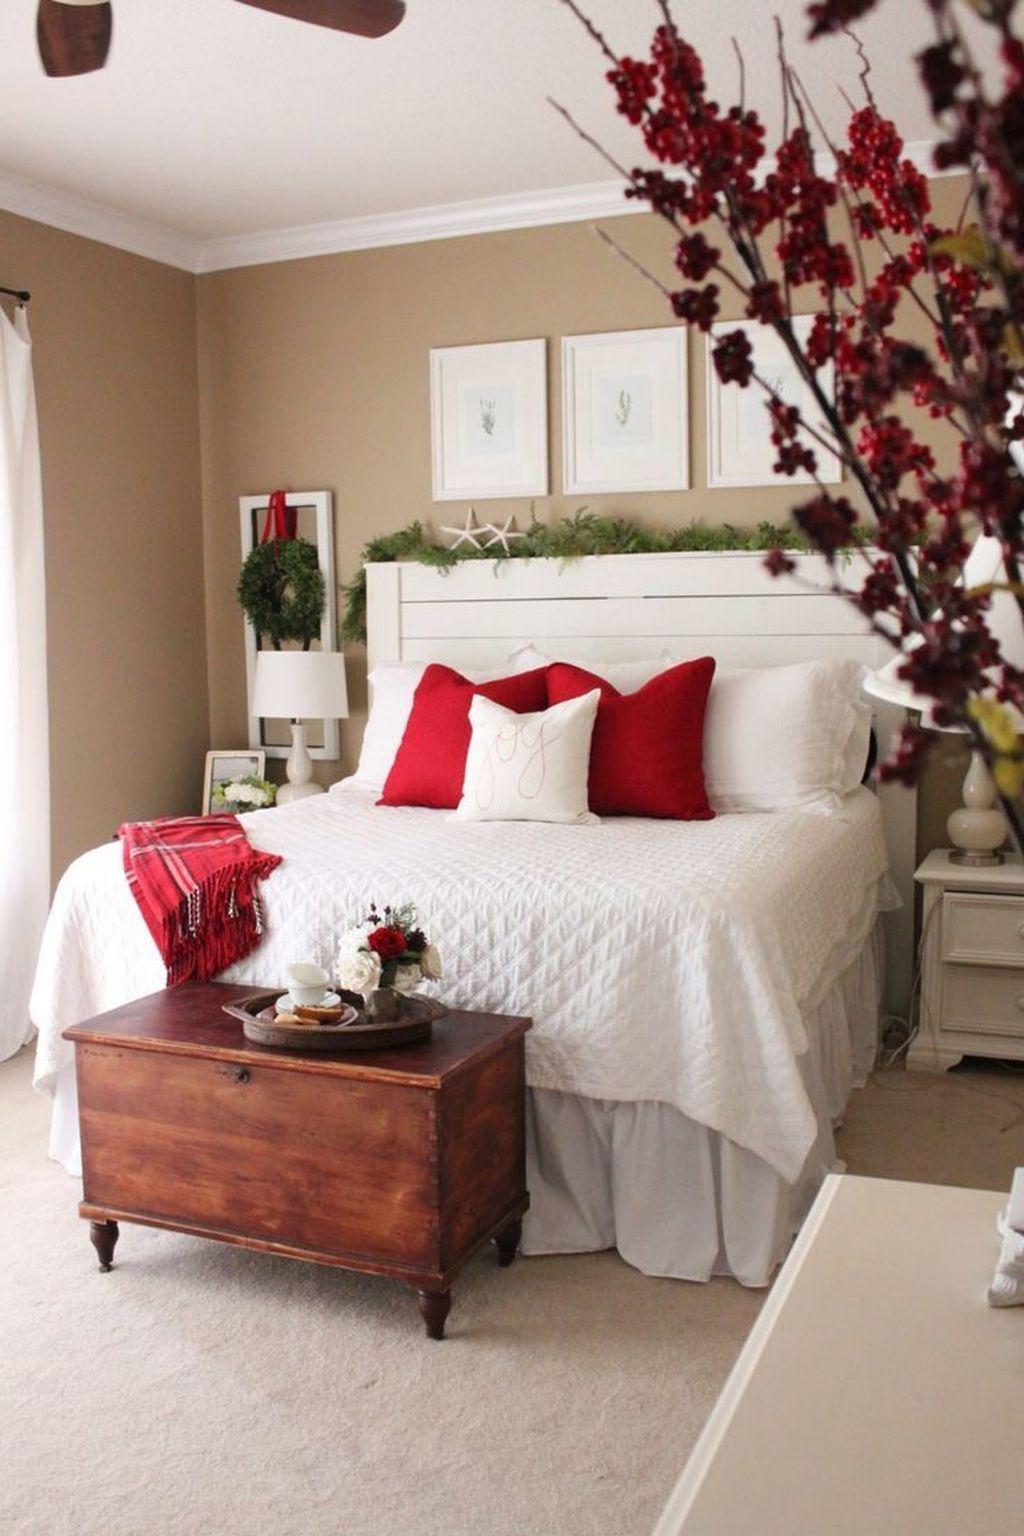 56 Easy DIY Christmas Decorations Ideas For